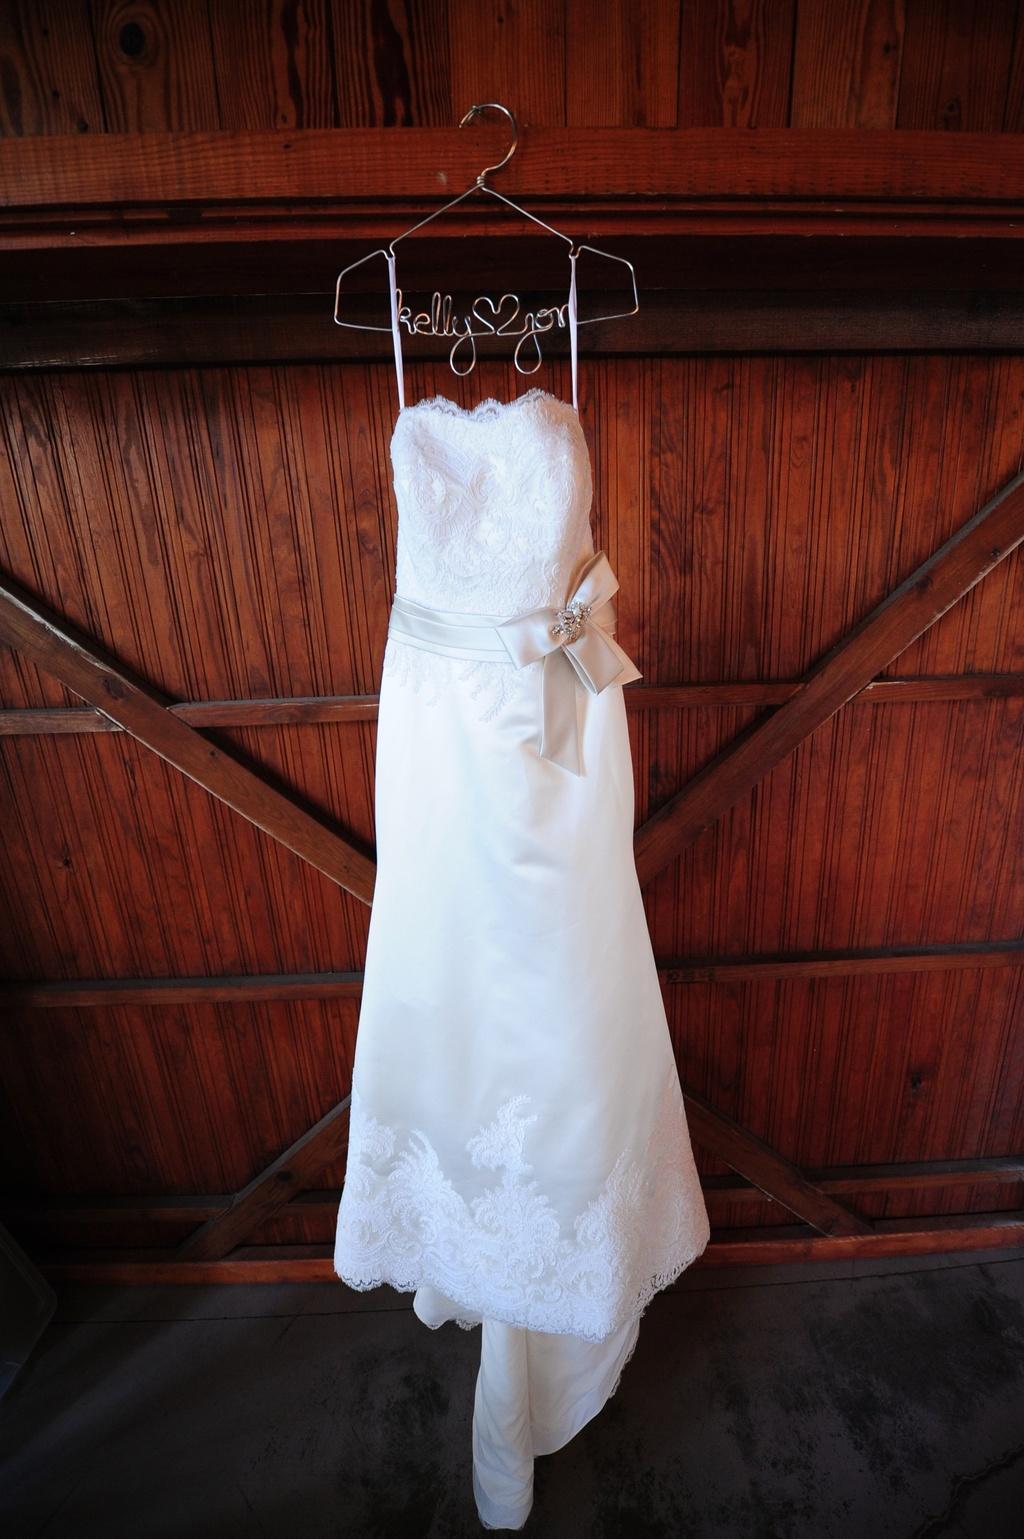 White-lace-wedding-dress-personalized-wedding-hanger_0.full